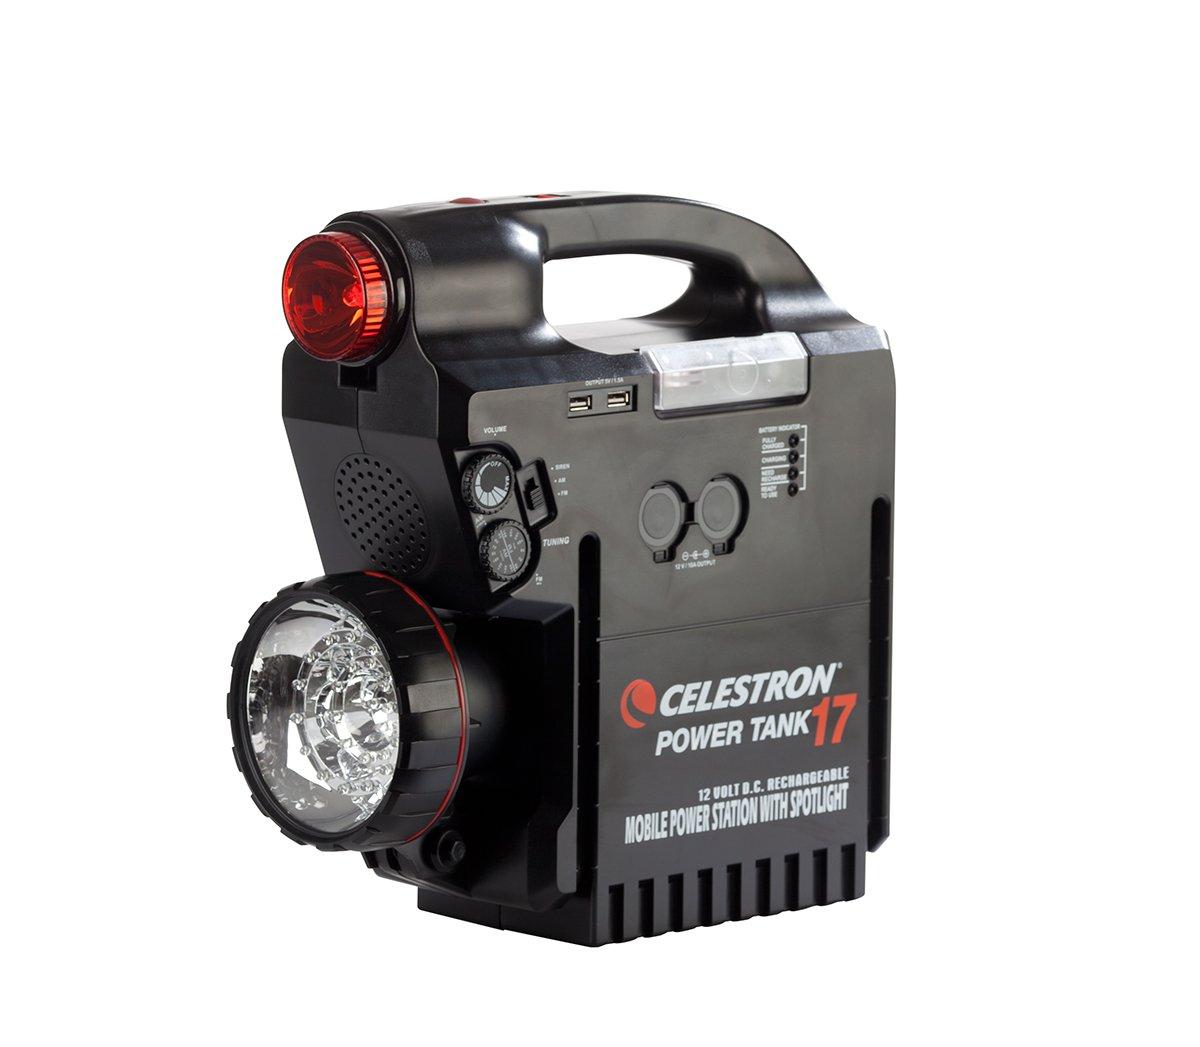 Celestron Celestron Rechargeable Power Supply PowerTank 17, 12v 17Ah, Black (18777)